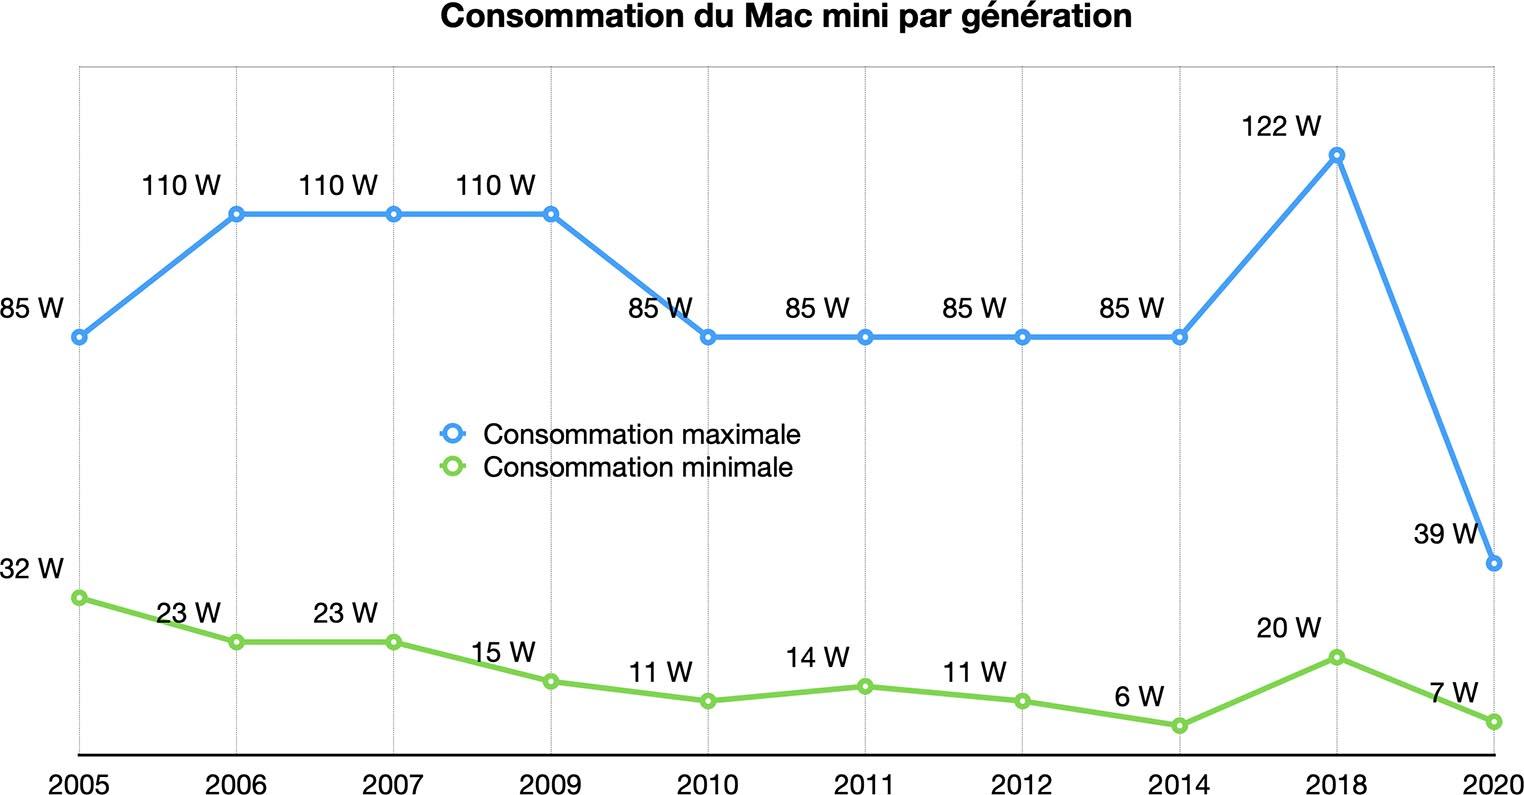 Évolution consommation Mac mini